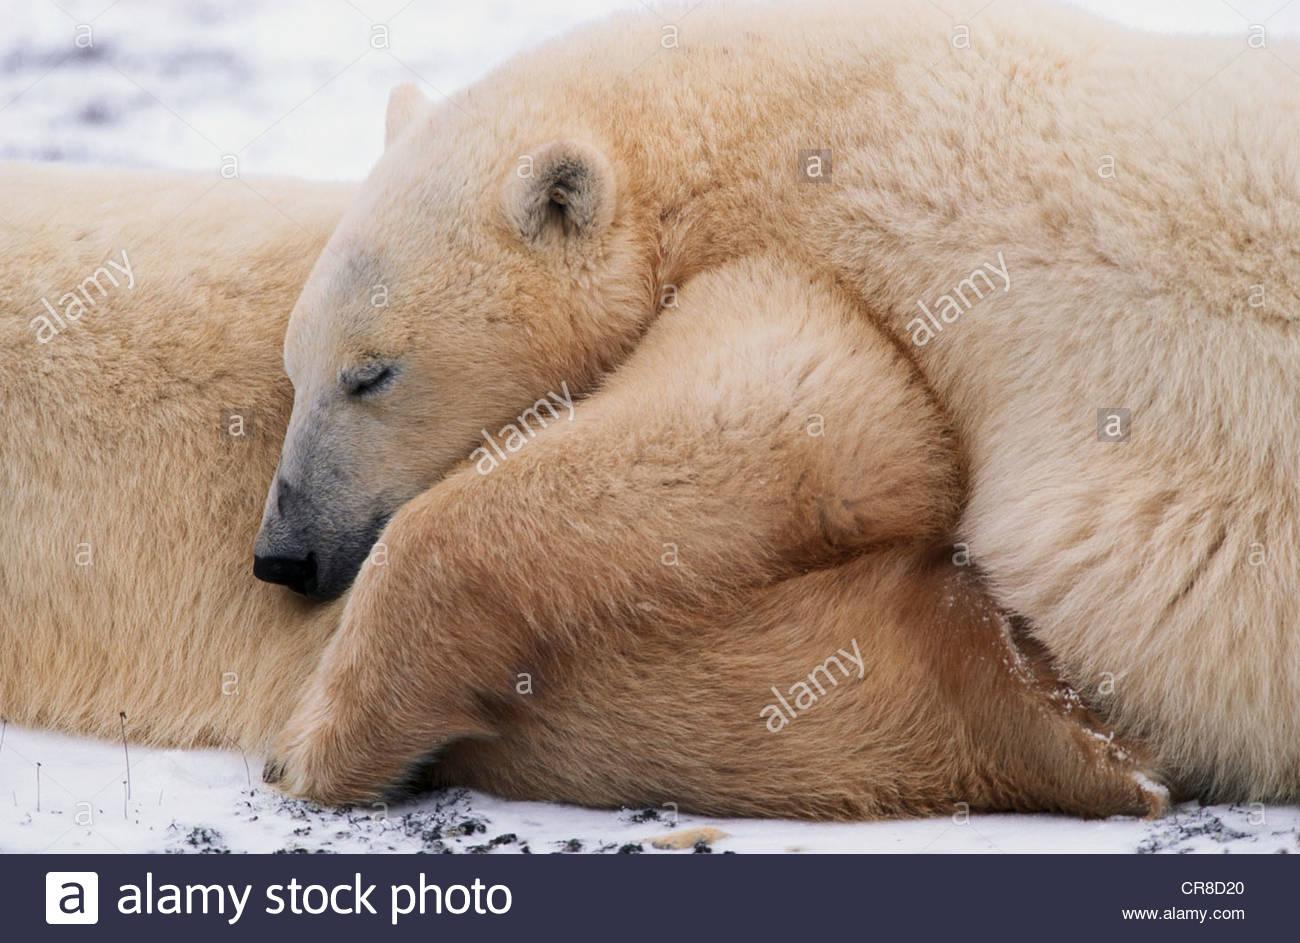 Two Polar bears sleeping. - Stock Image